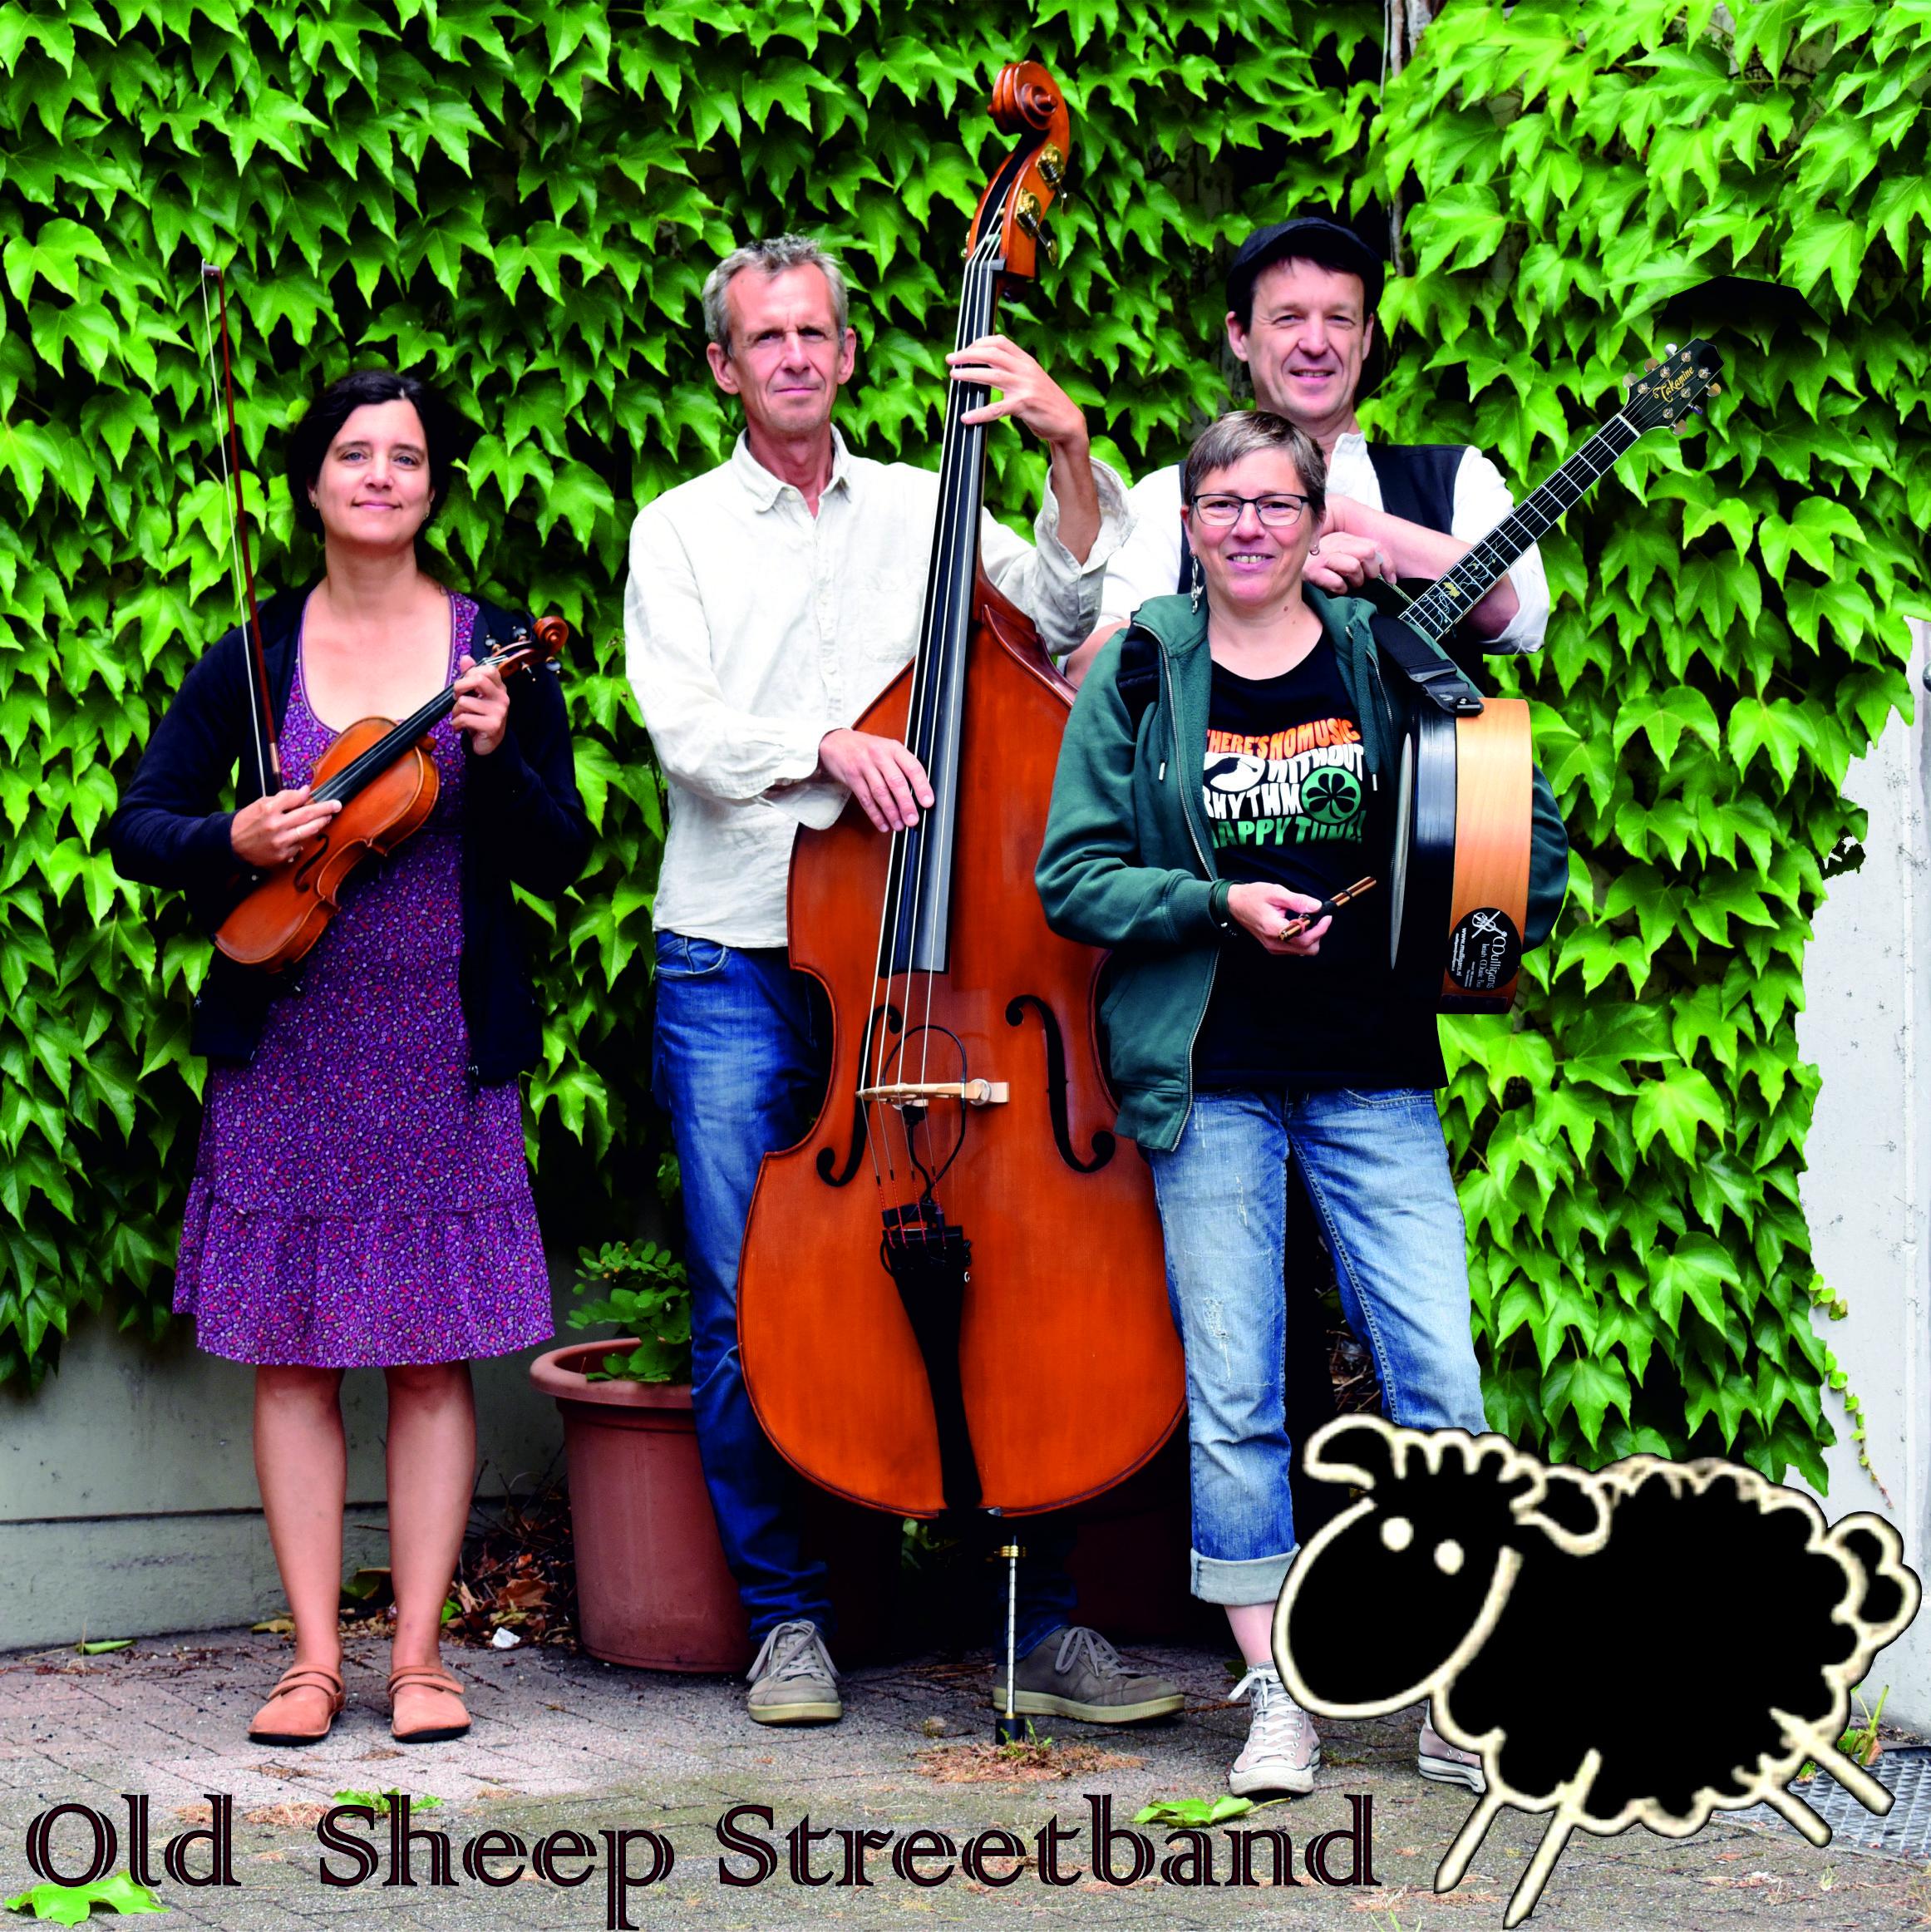 Old Sheep Streetband